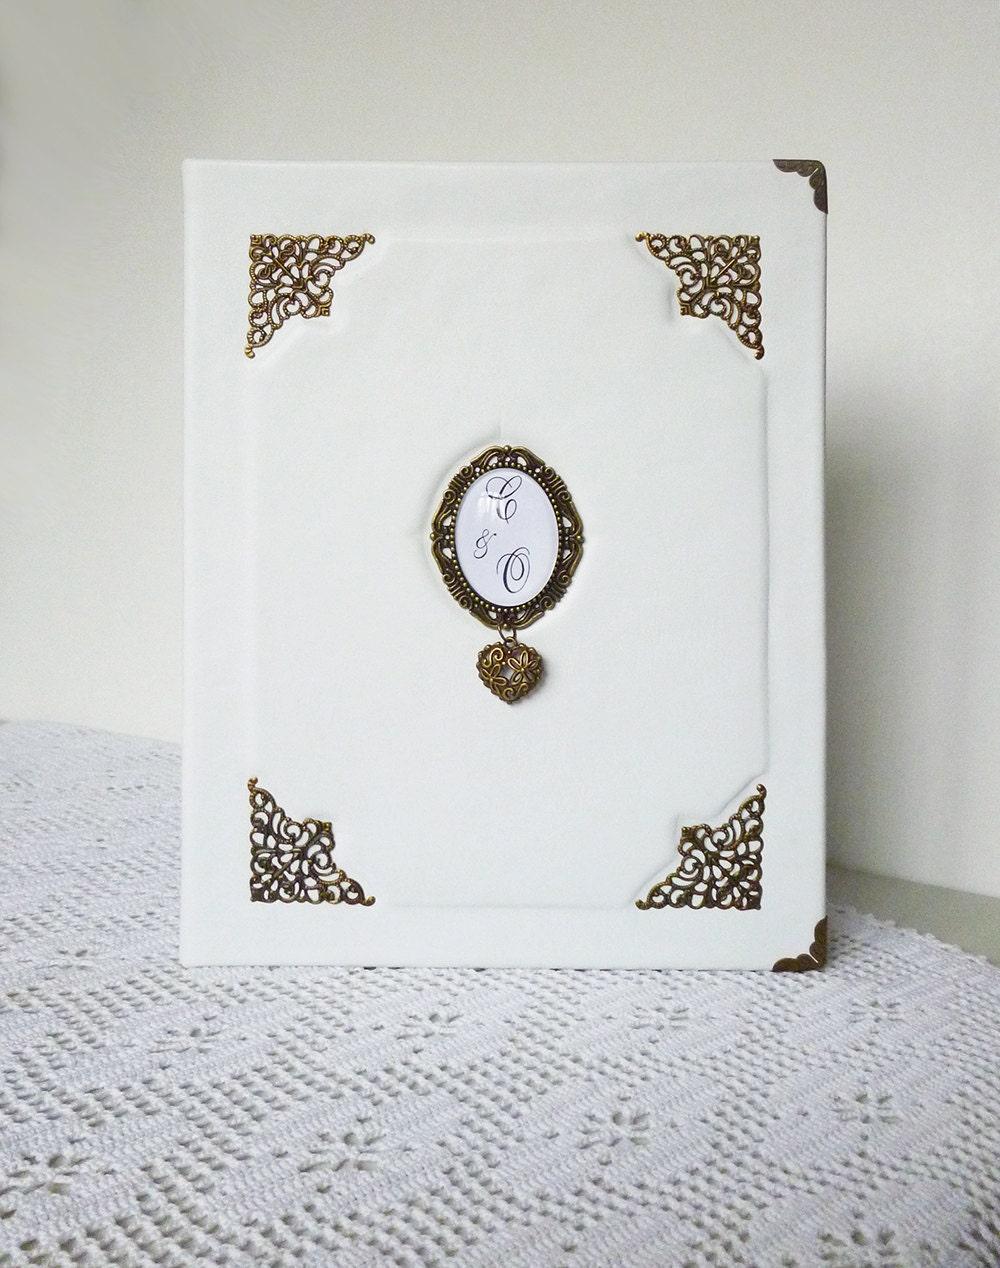 wedding album personalized leather photo album monogrammed. Black Bedroom Furniture Sets. Home Design Ideas